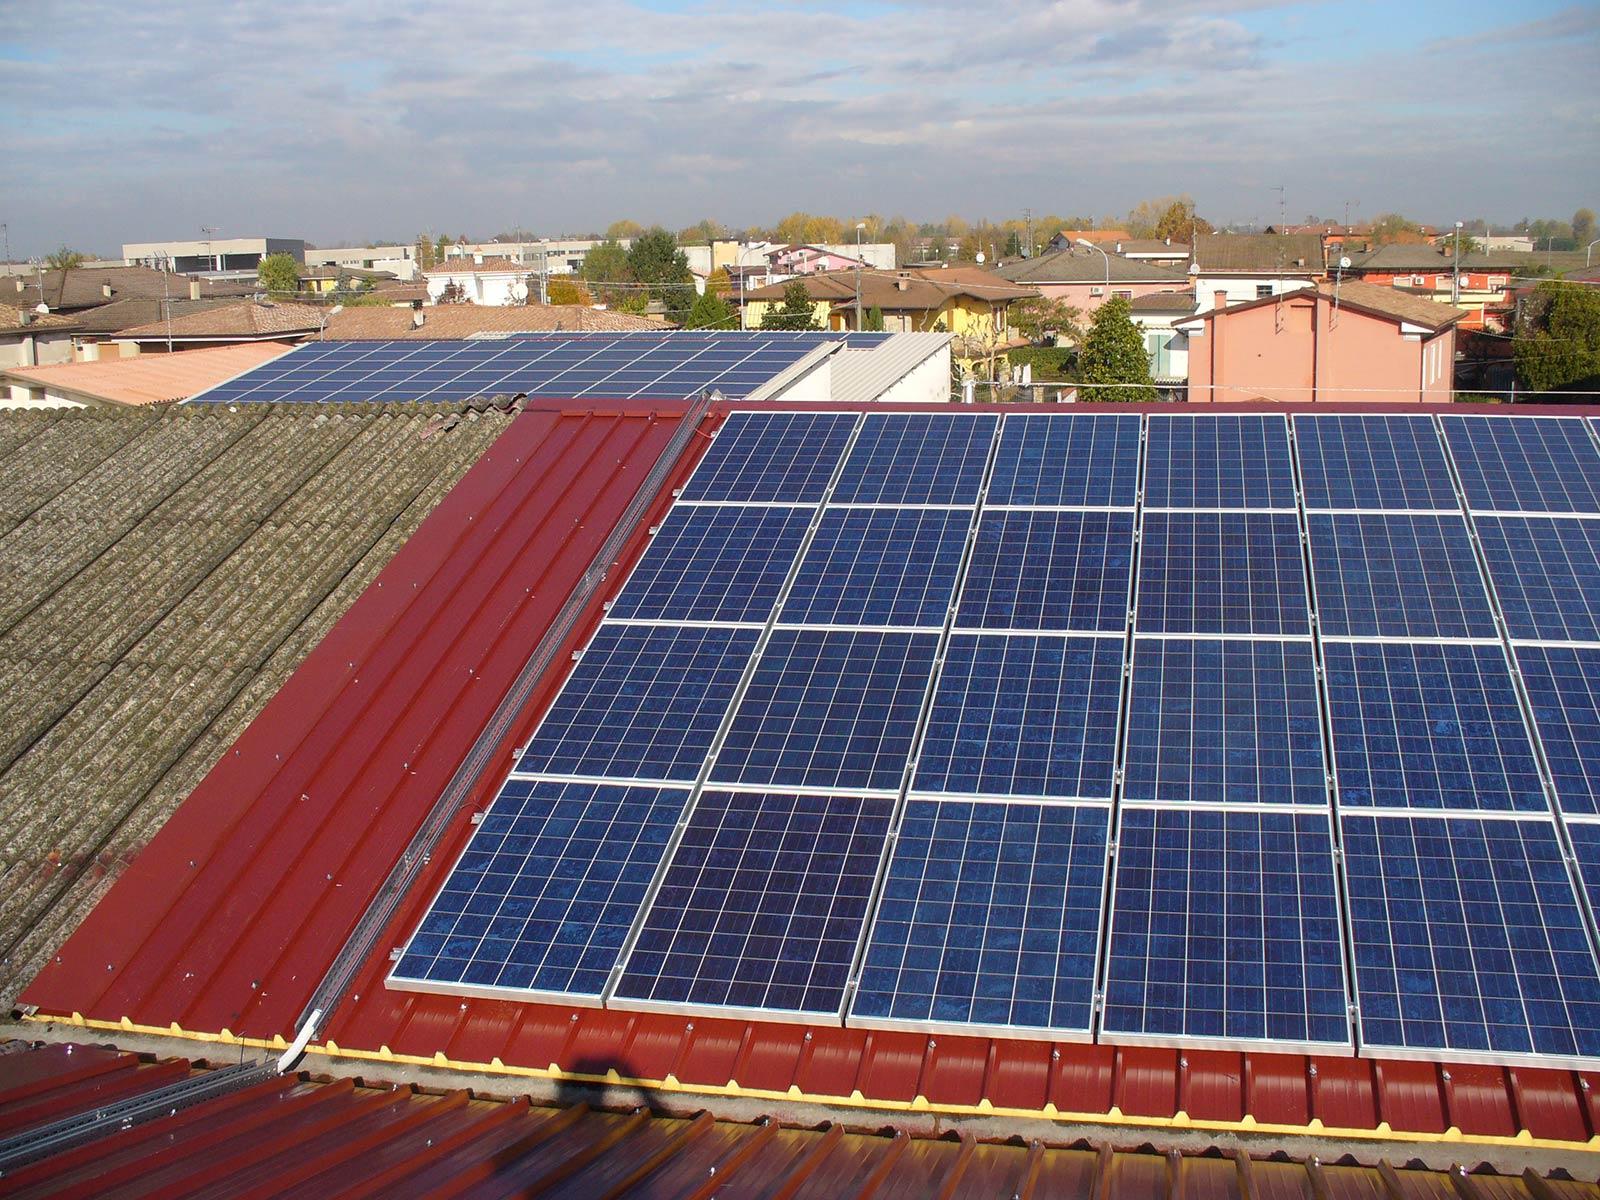 pannelli-fotovoltaici-1